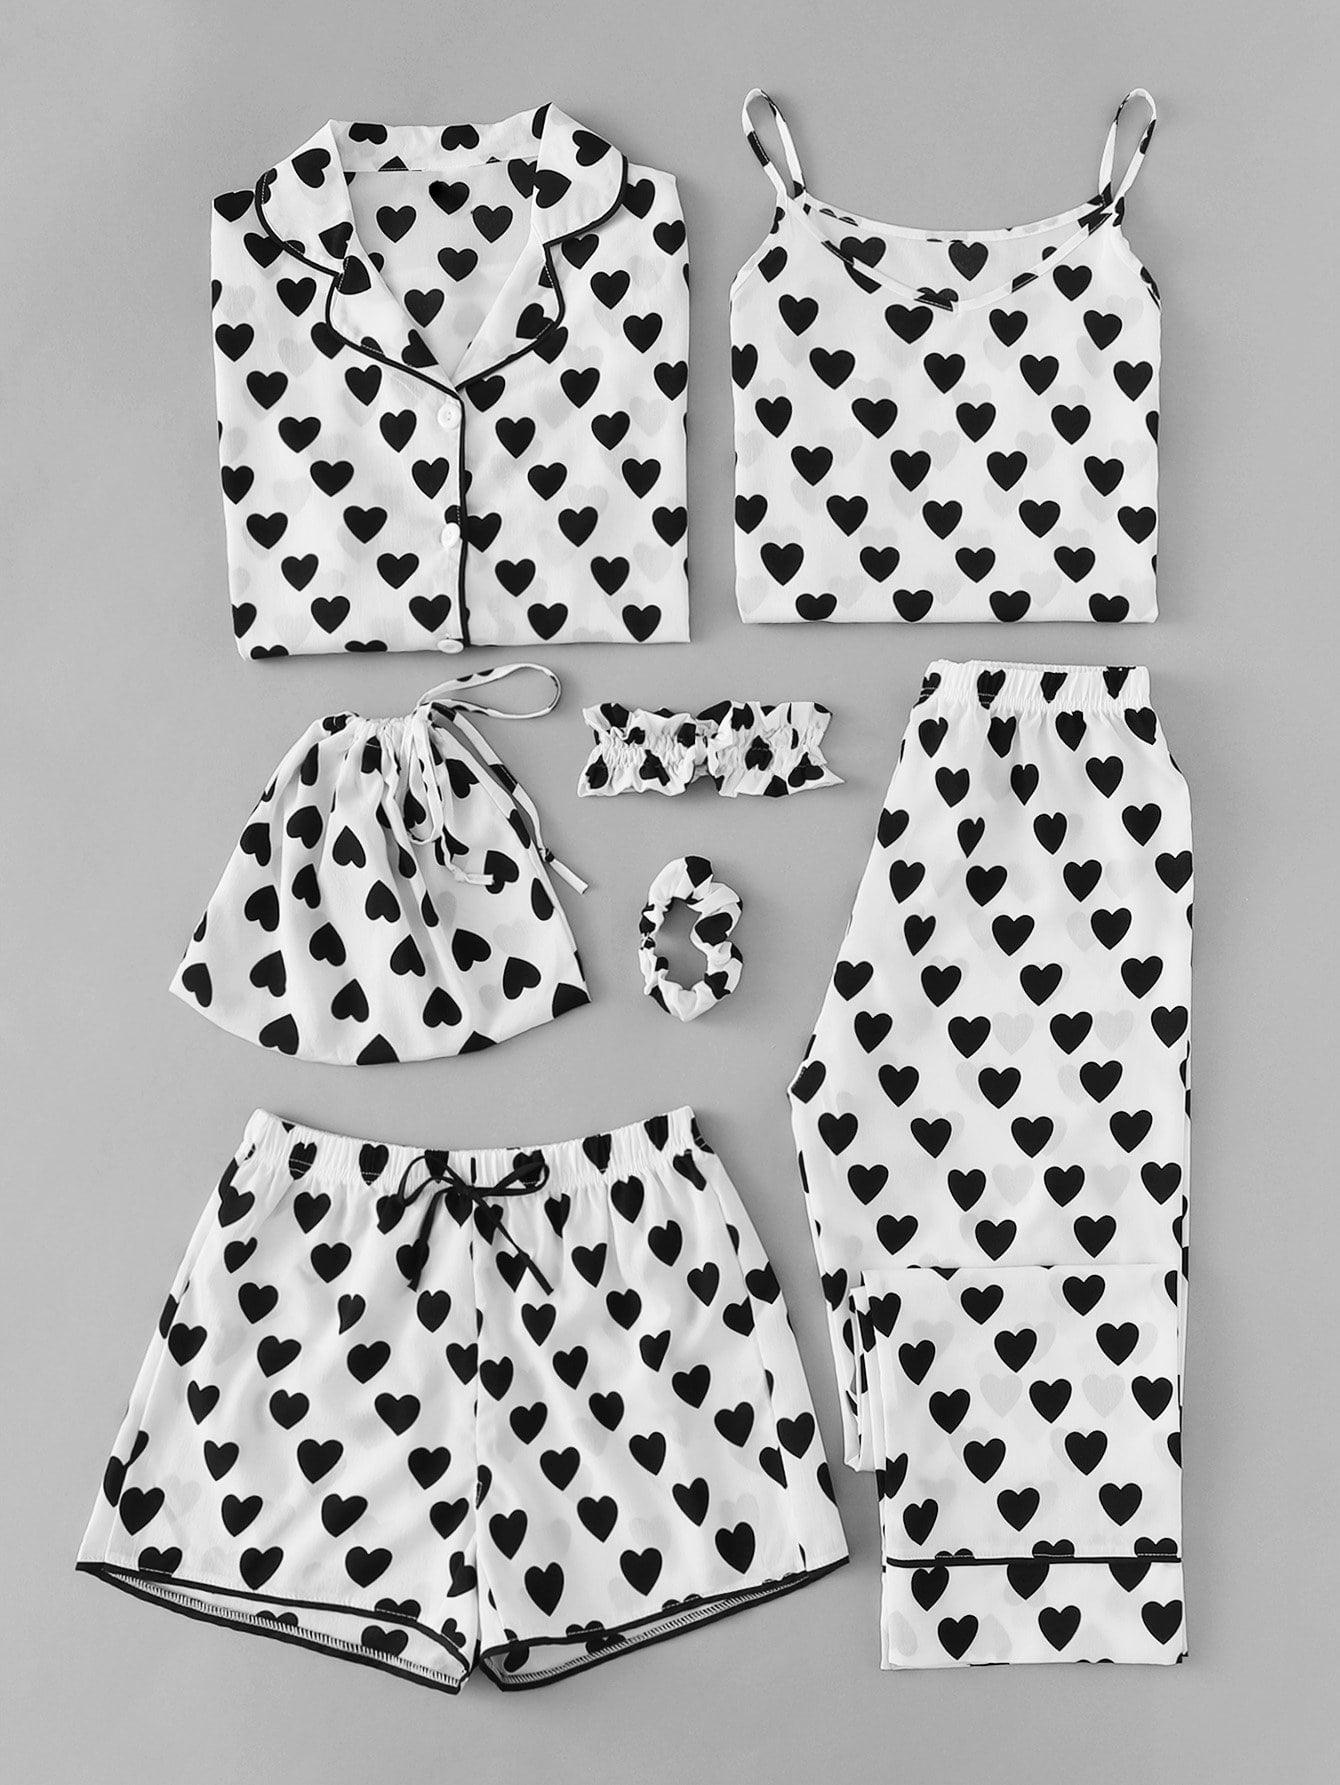 7pcs Cami Pajama Set mit Herz Muster und Bluse